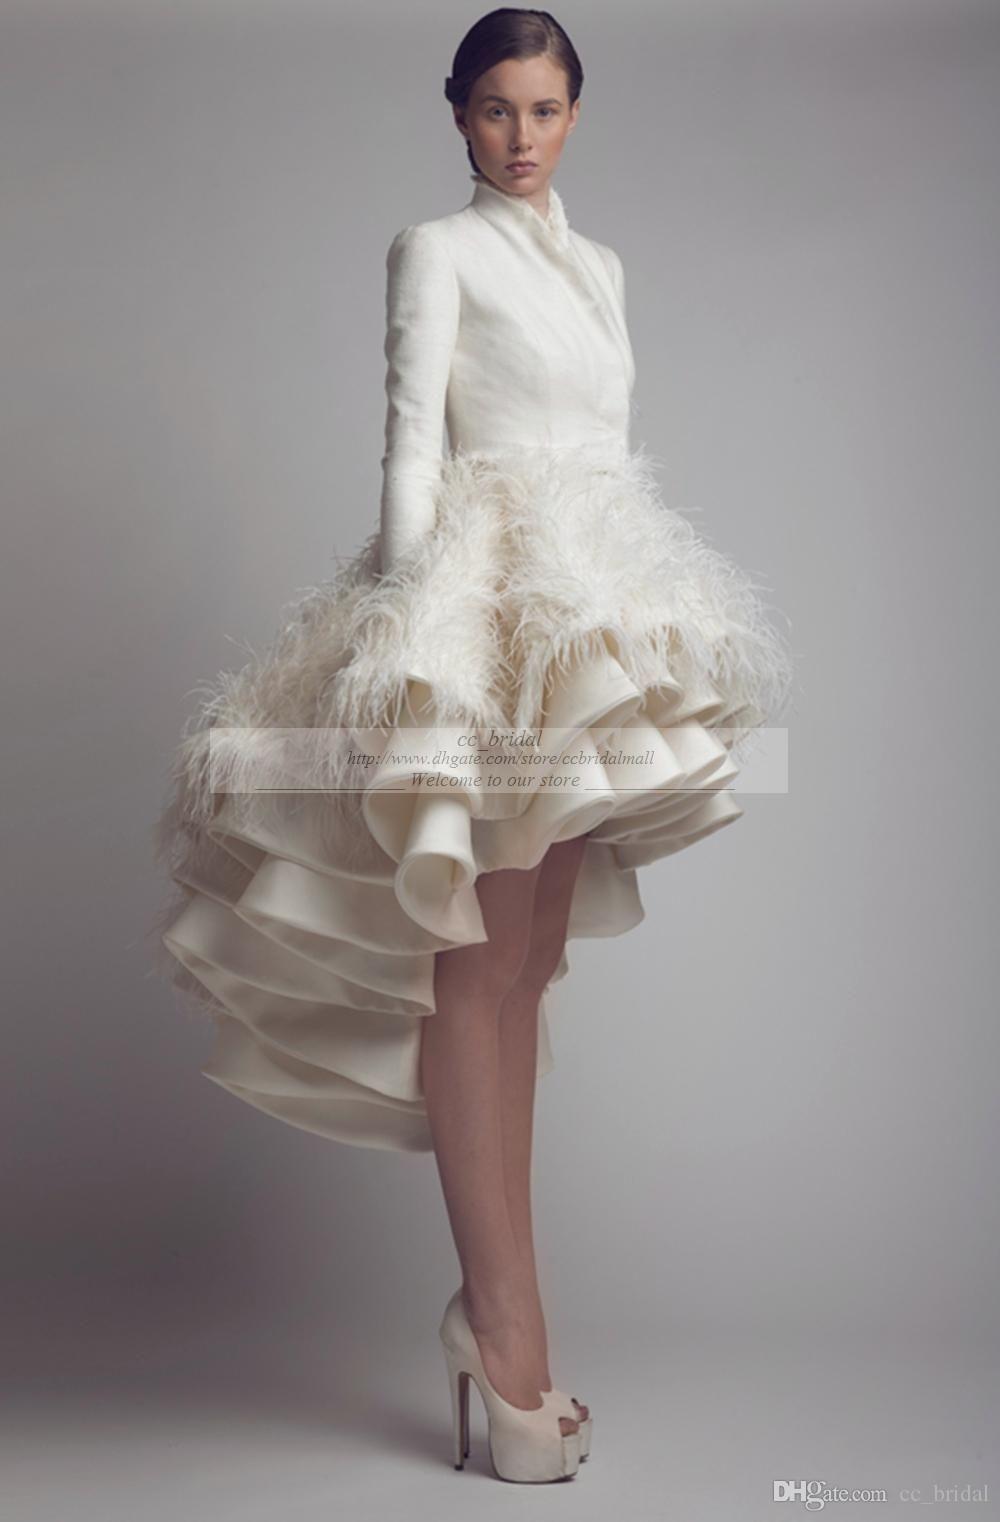 Discountdesigner Krikor Jabotian High Low Wedding Dresses High Collar Ruffle Feather A Line Satin Long Sleeve Bridal Gowns Plus Size Wedding Gowns From Cc Brida Wedding Dresses High Low Short Wedding Dress [ 1522 x 1000 Pixel ]